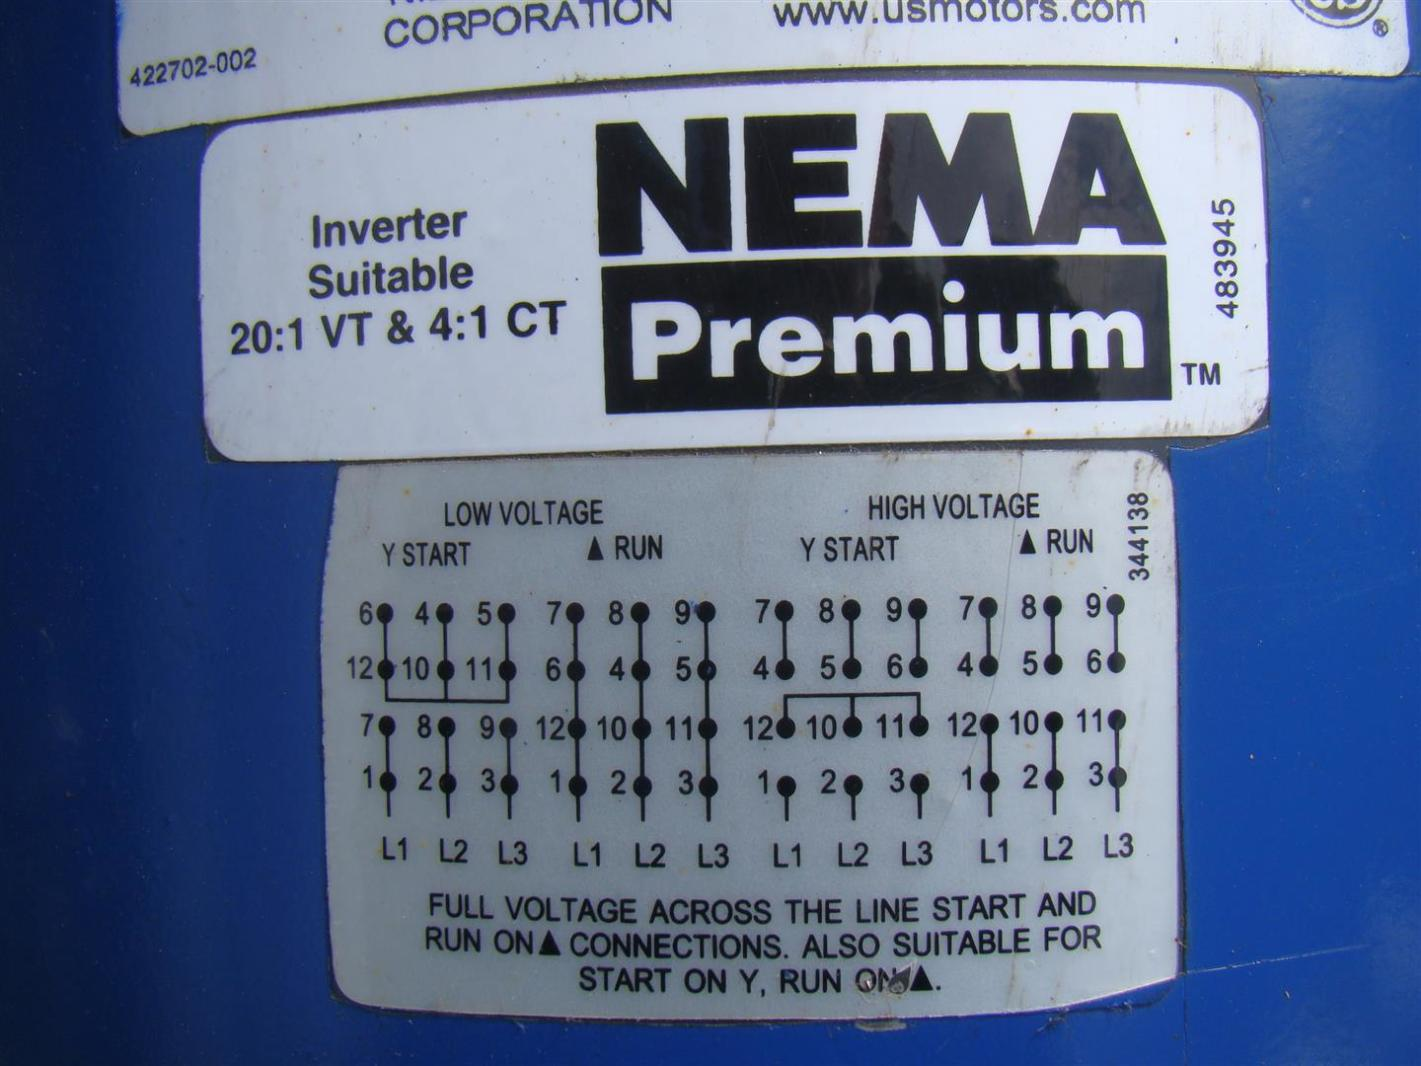 US Motors Nidec 3 Phase Electric Motor 20 HP Inverter Duty 1775 RPM ...